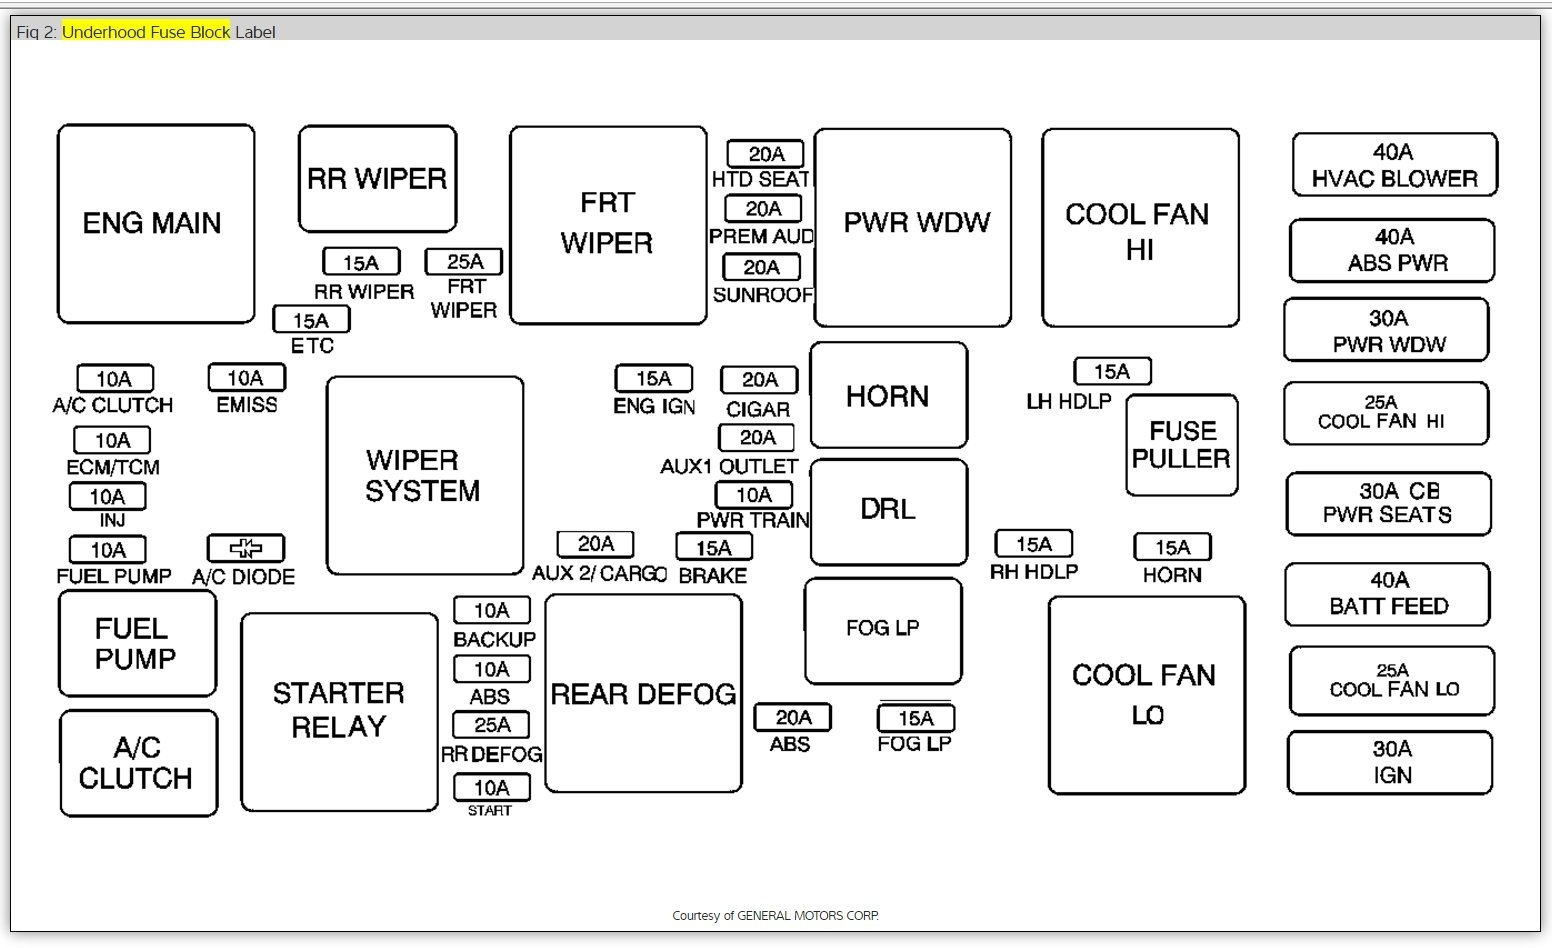 2005 Equinox Fuse Box - Wiring Diagram All school-hardware -  school-hardware.huevoprint.it | 2015 Chevy Equinox Fuse Diagram |  | Huevoprint